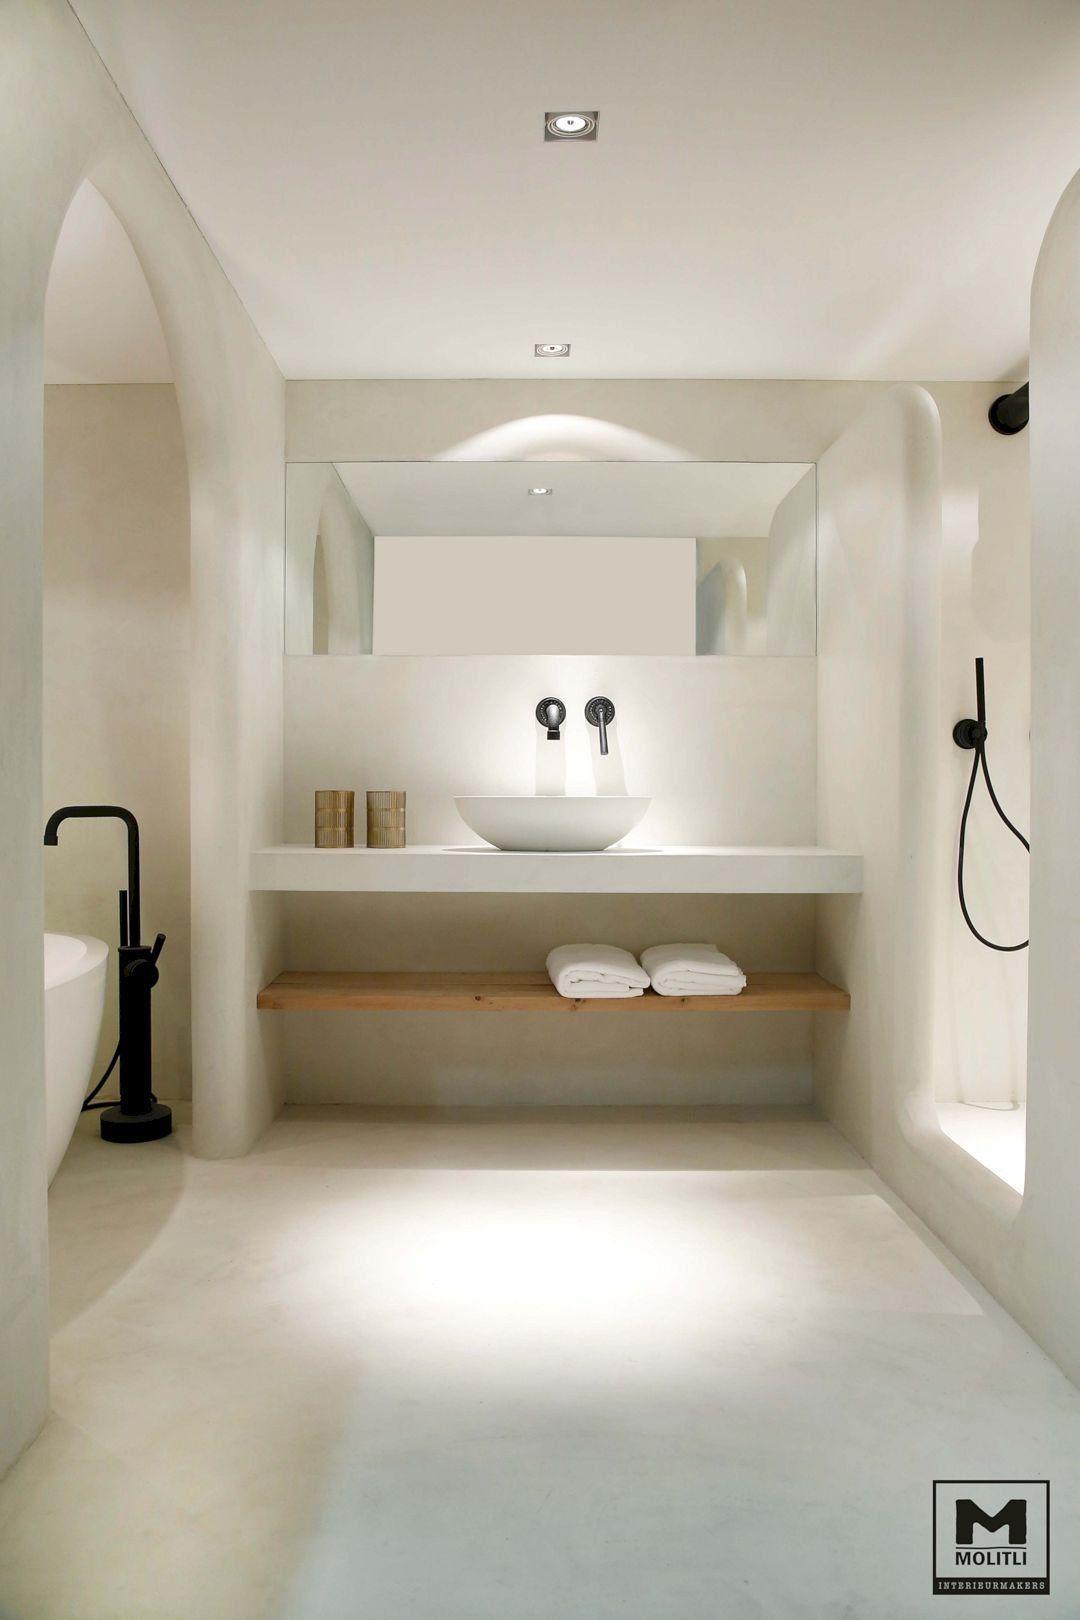 Stylish Modern Bathroom Design 65  욕실, 화장실 및 홈 오피스